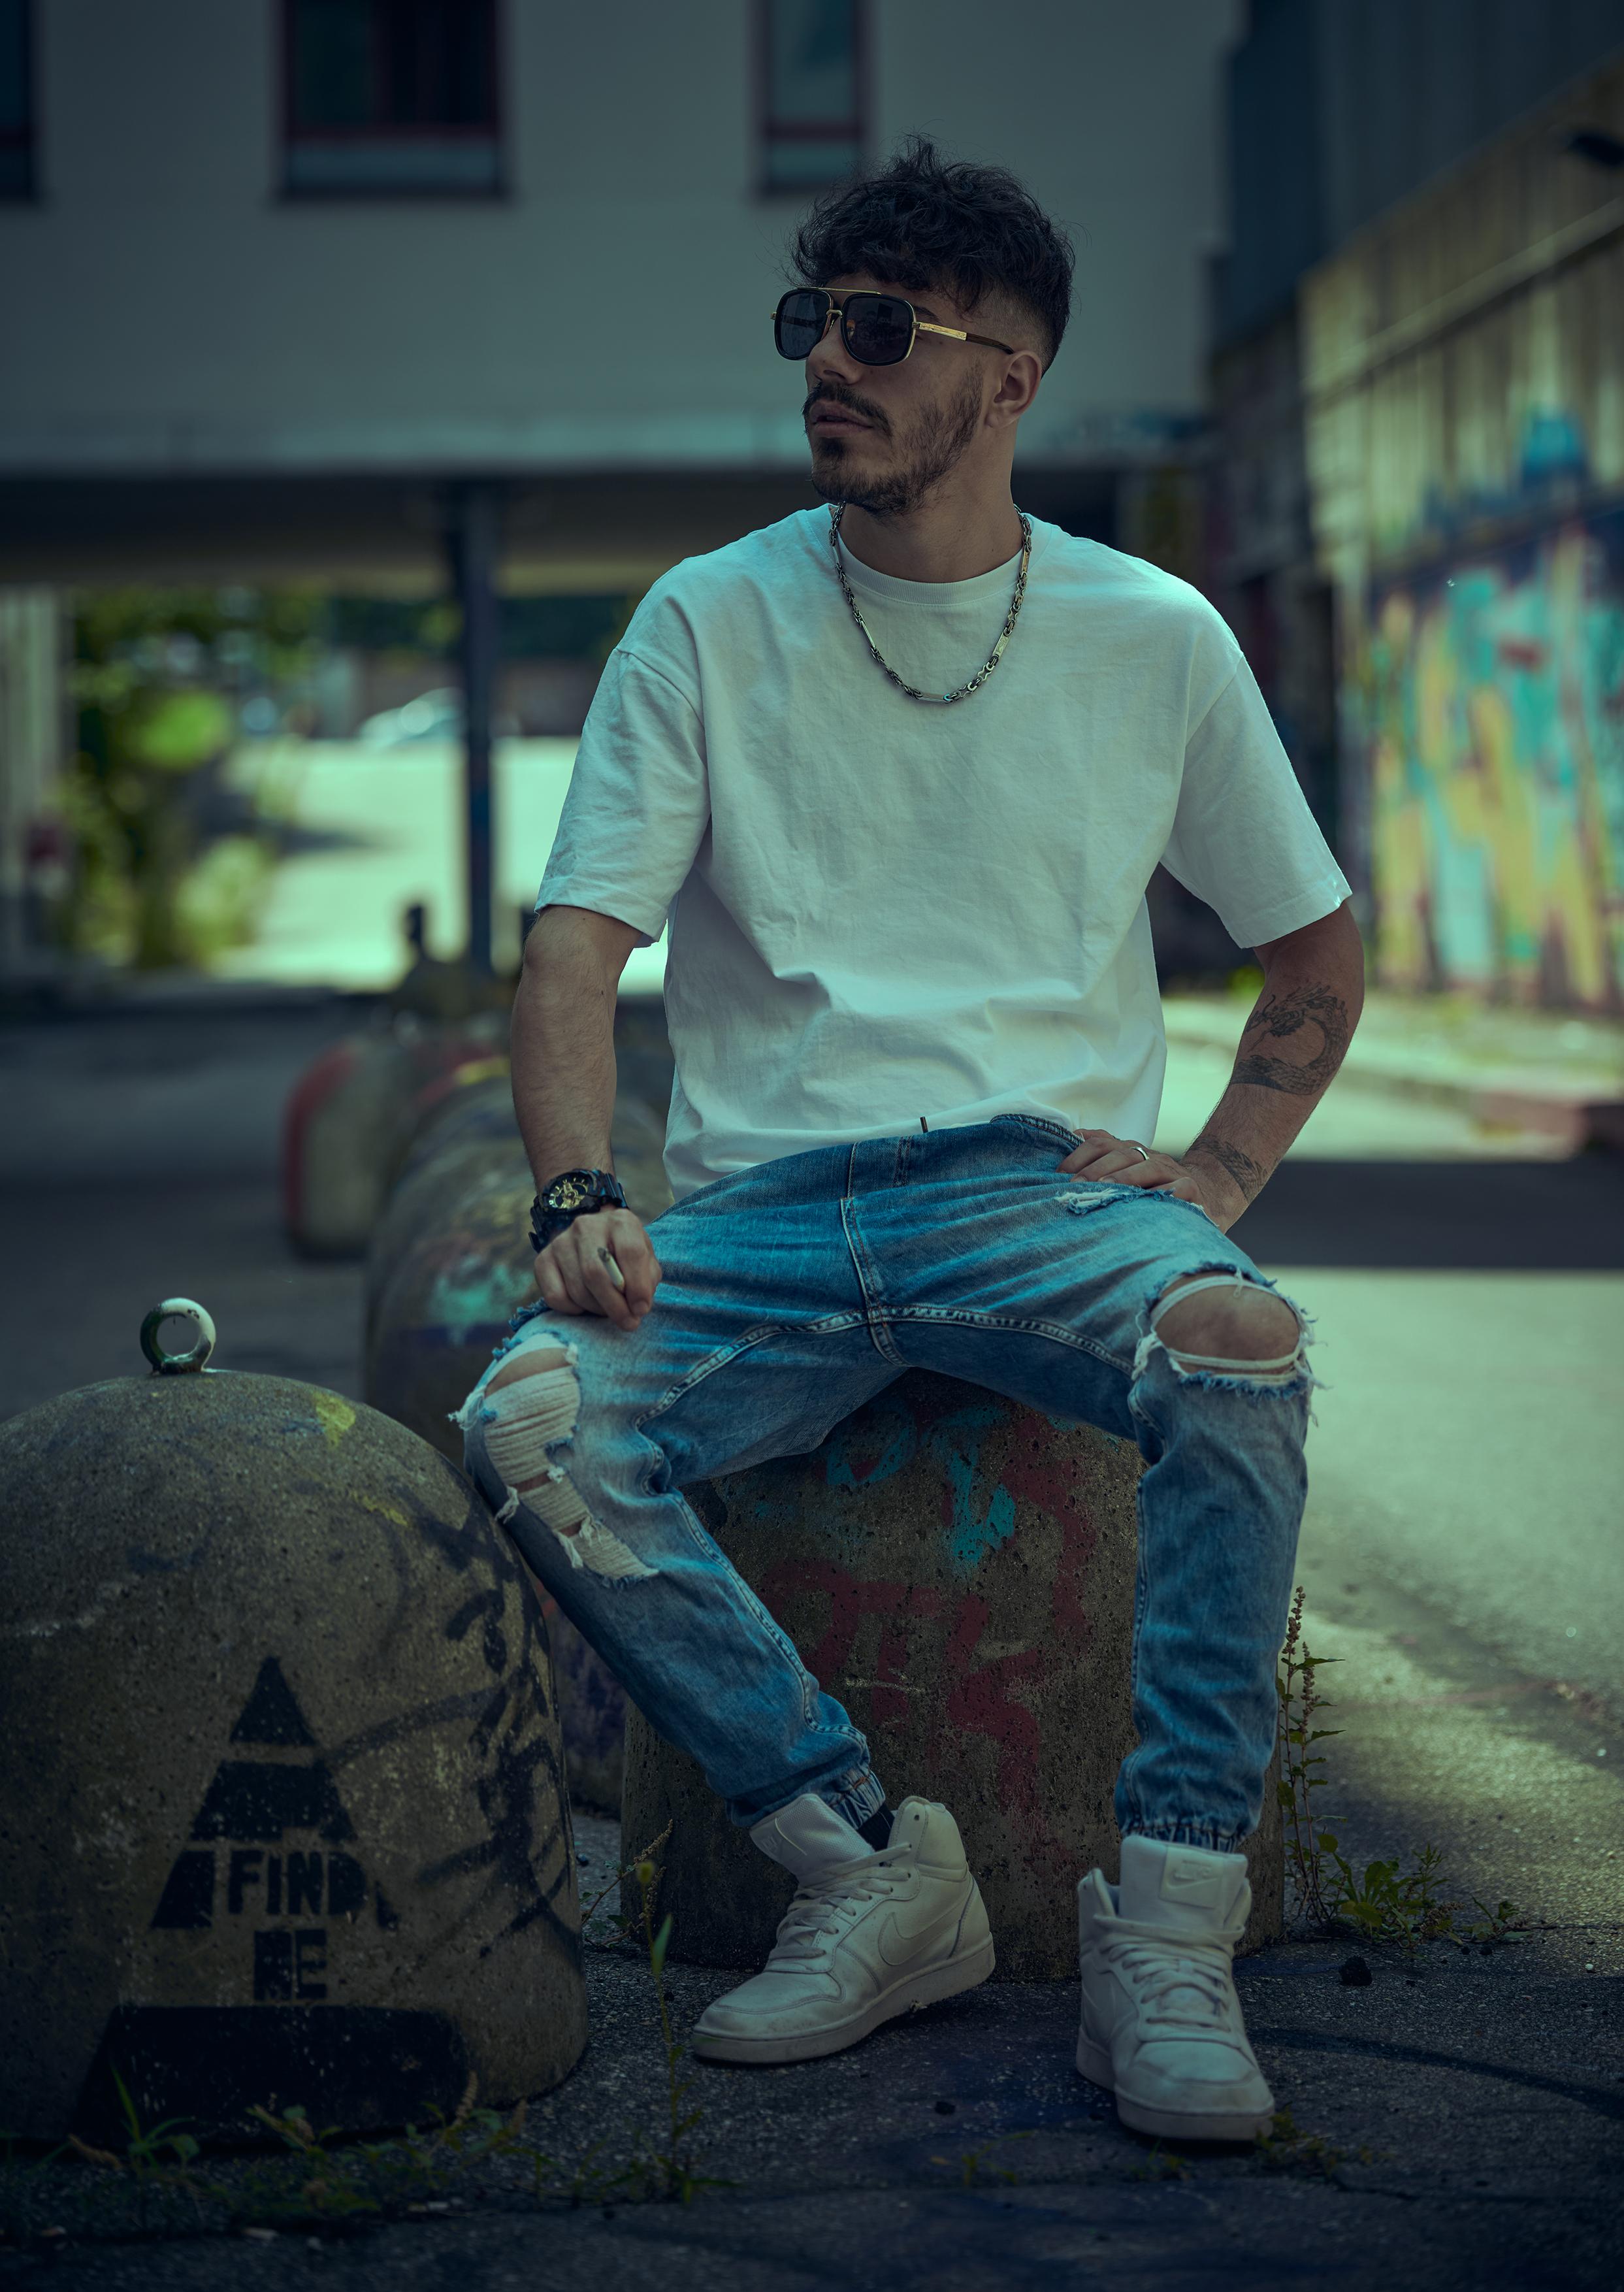 Model: Lorenzo LP